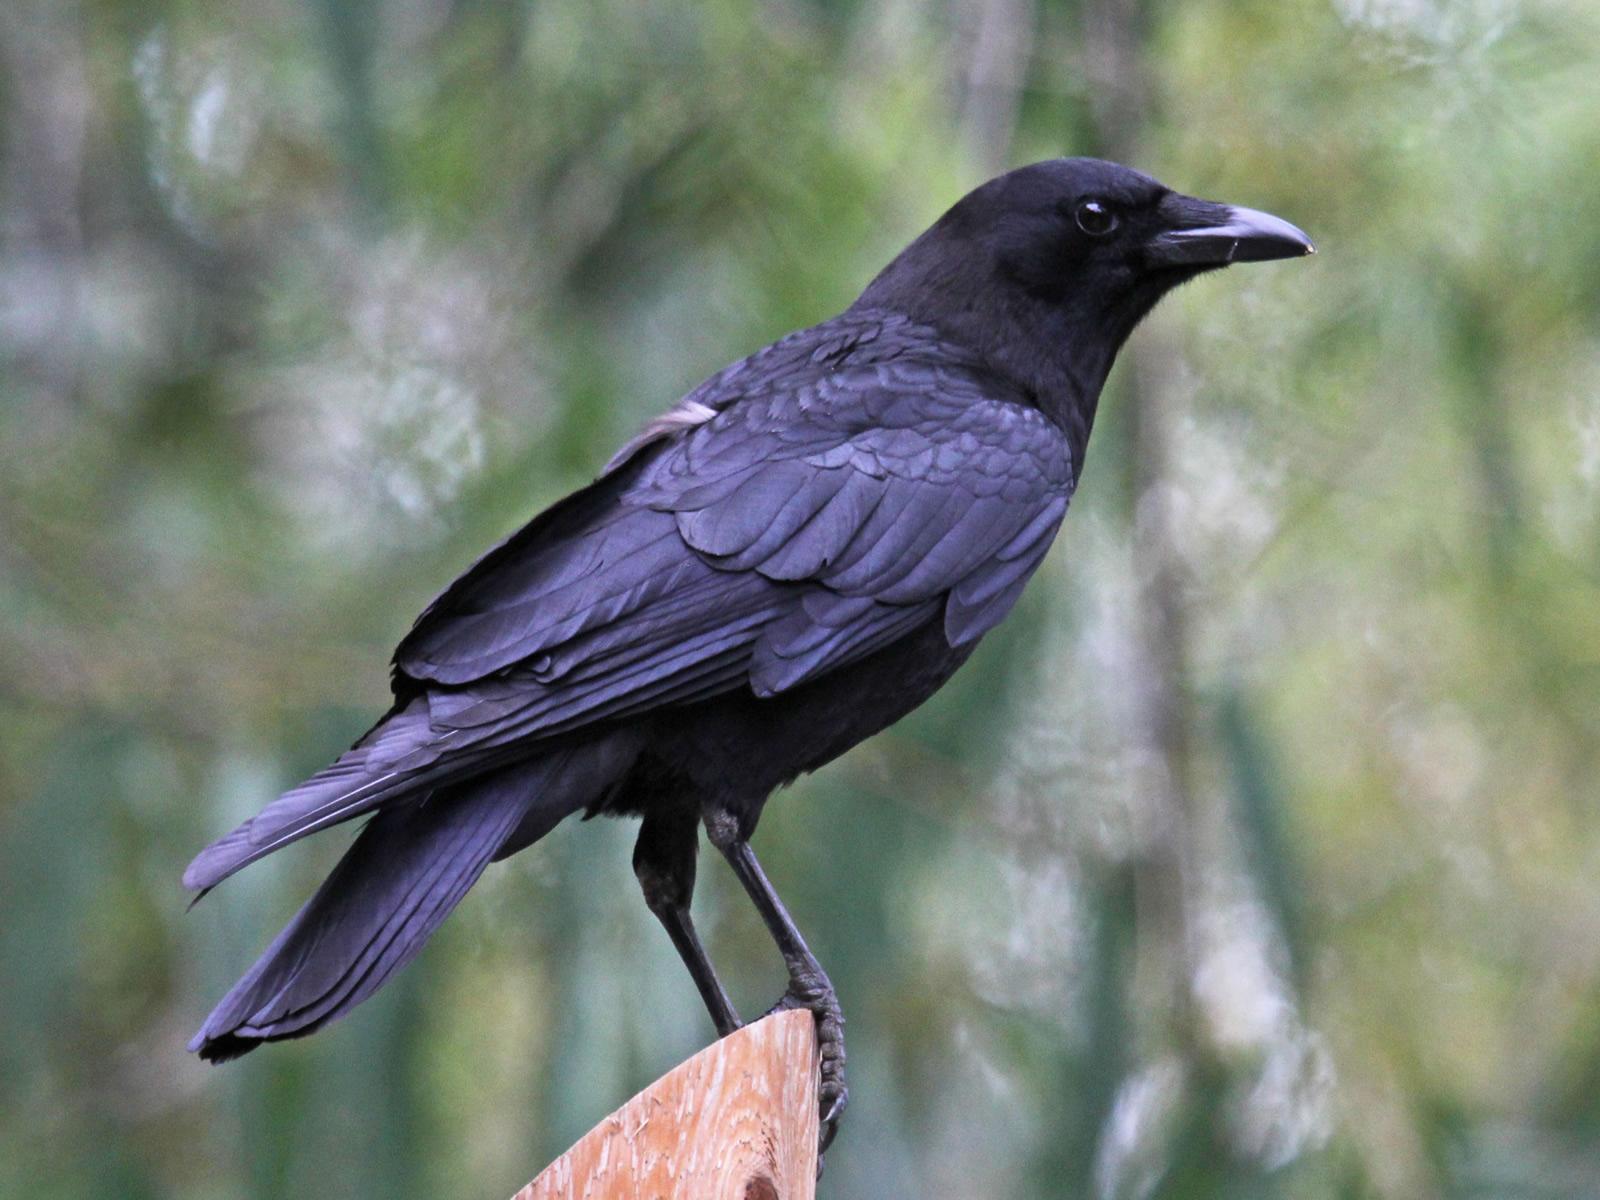 American Crow. Dick Daniels CC BY-SA 3.0